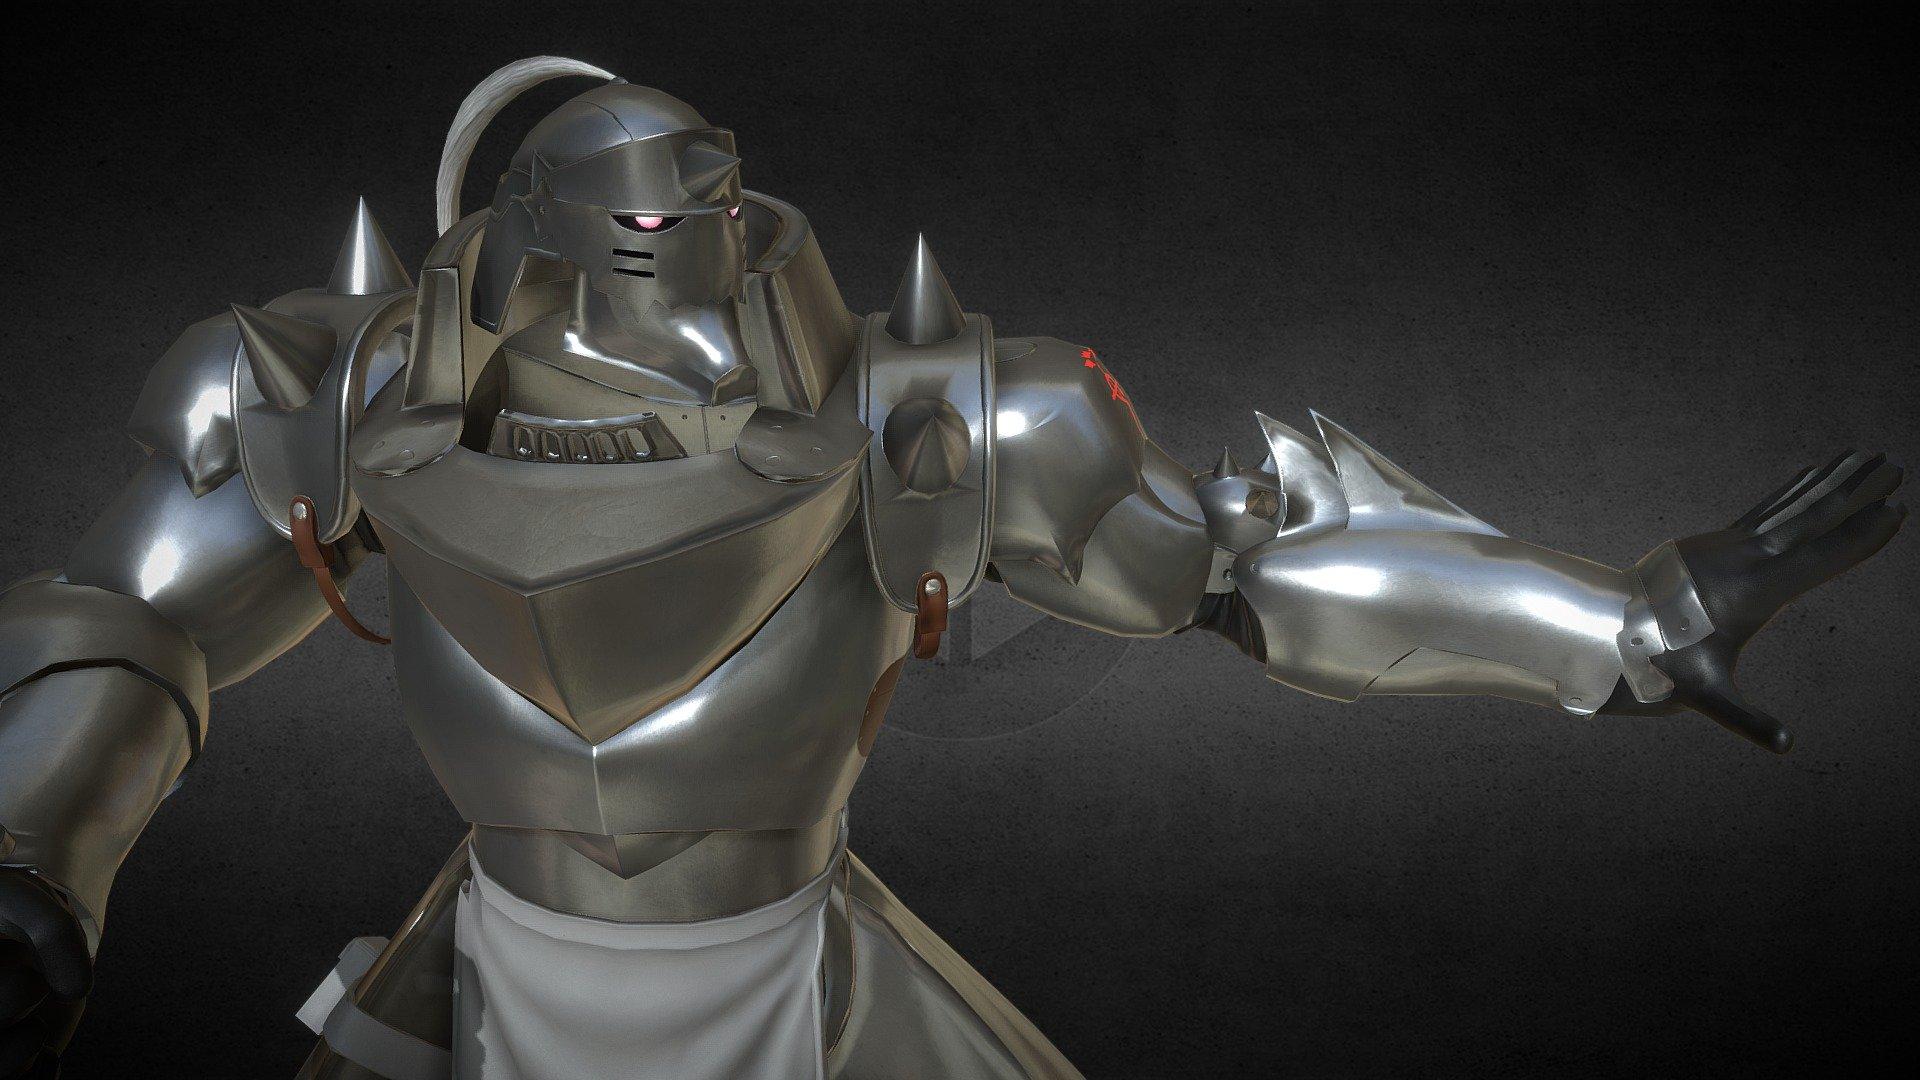 Fullmetal Alchemist Brotherhood Alphonse Elric 3d Model By